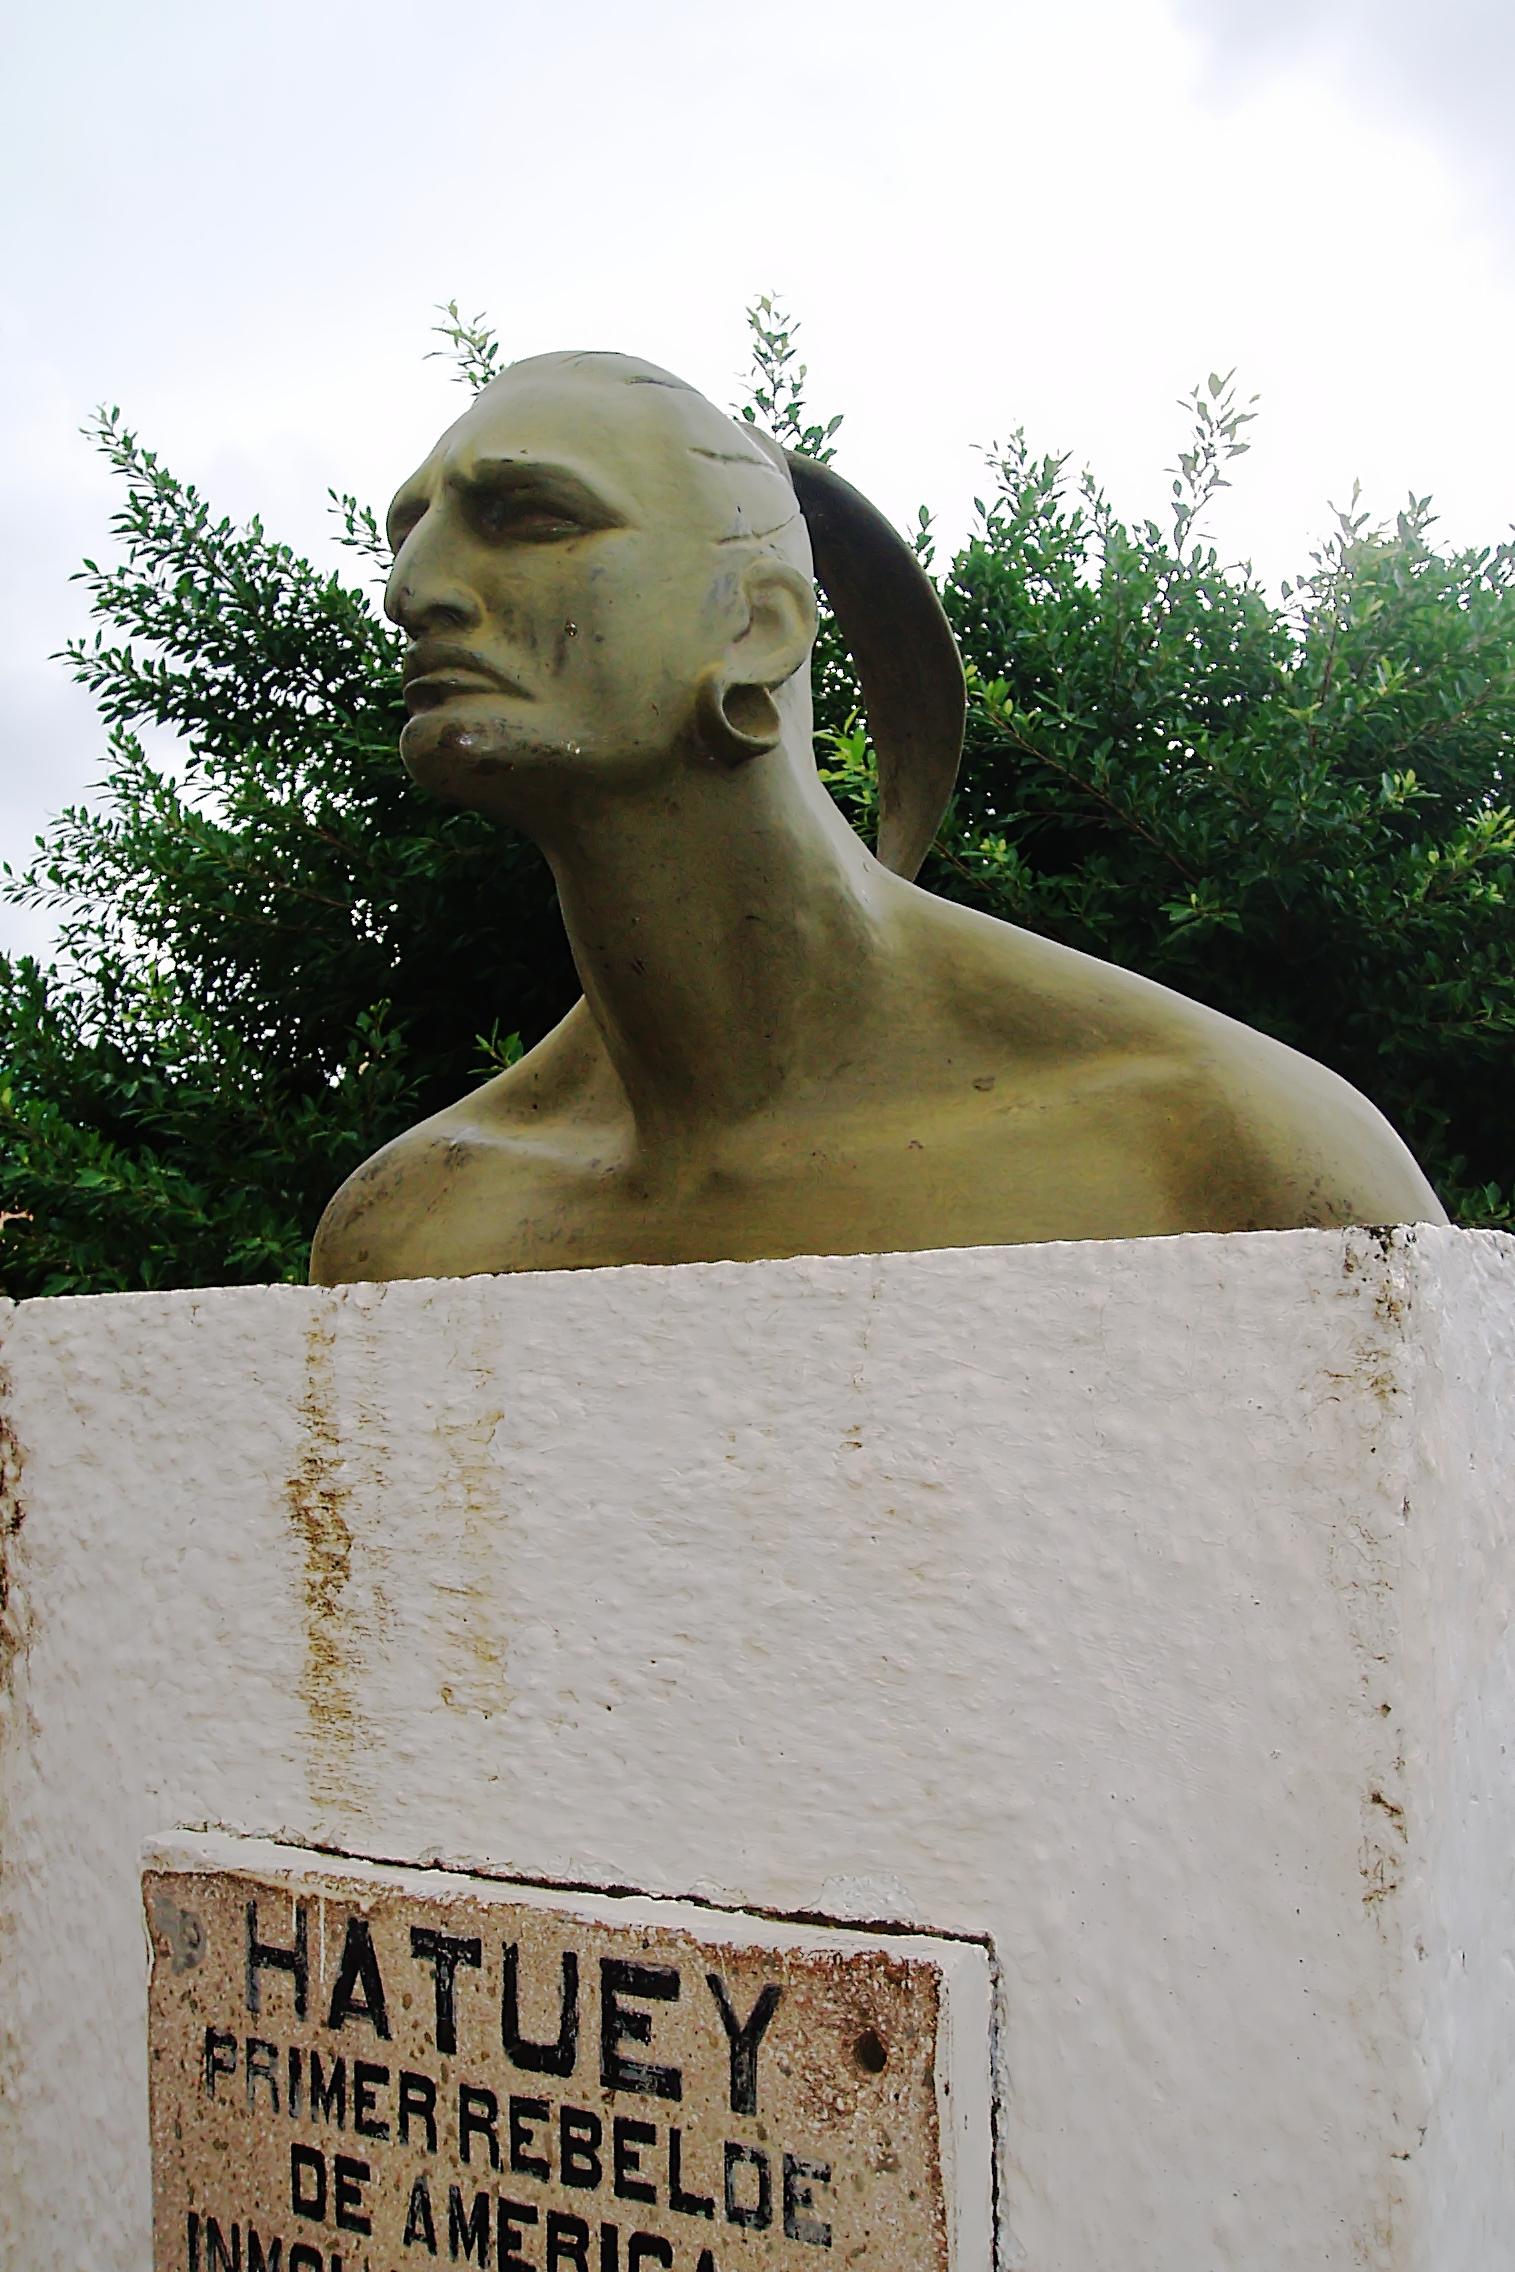 Depiction of Hatuey